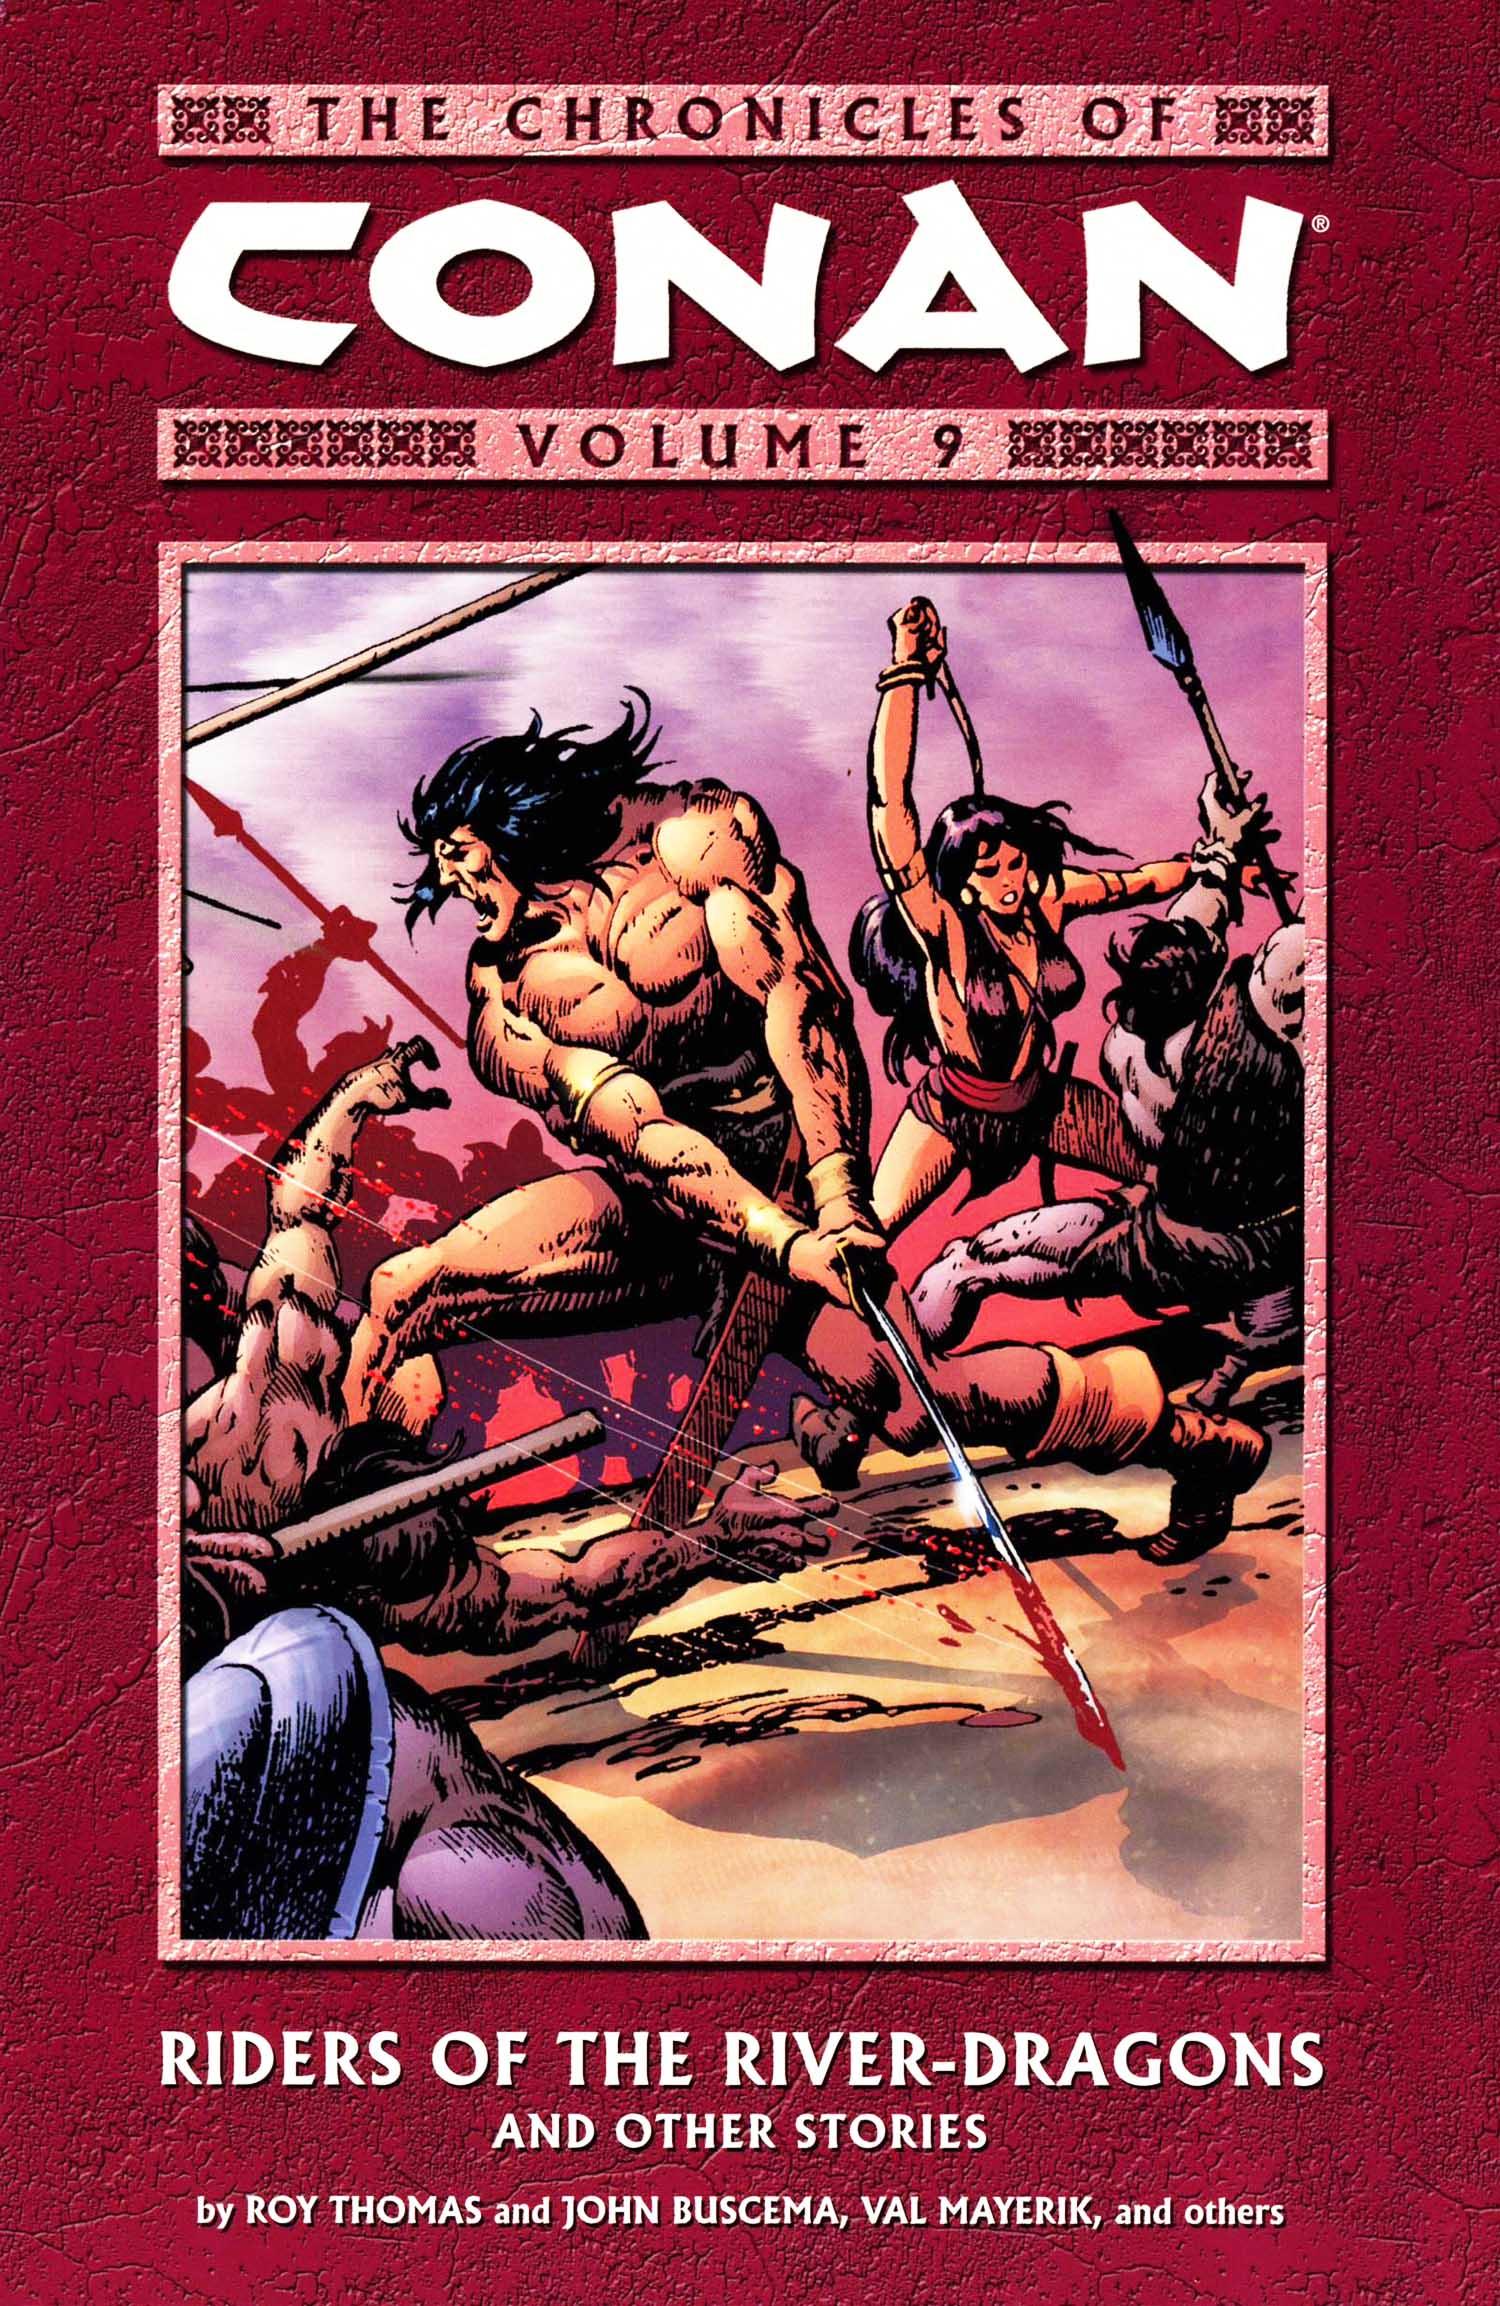 The Chronicles of Conan Volume 9